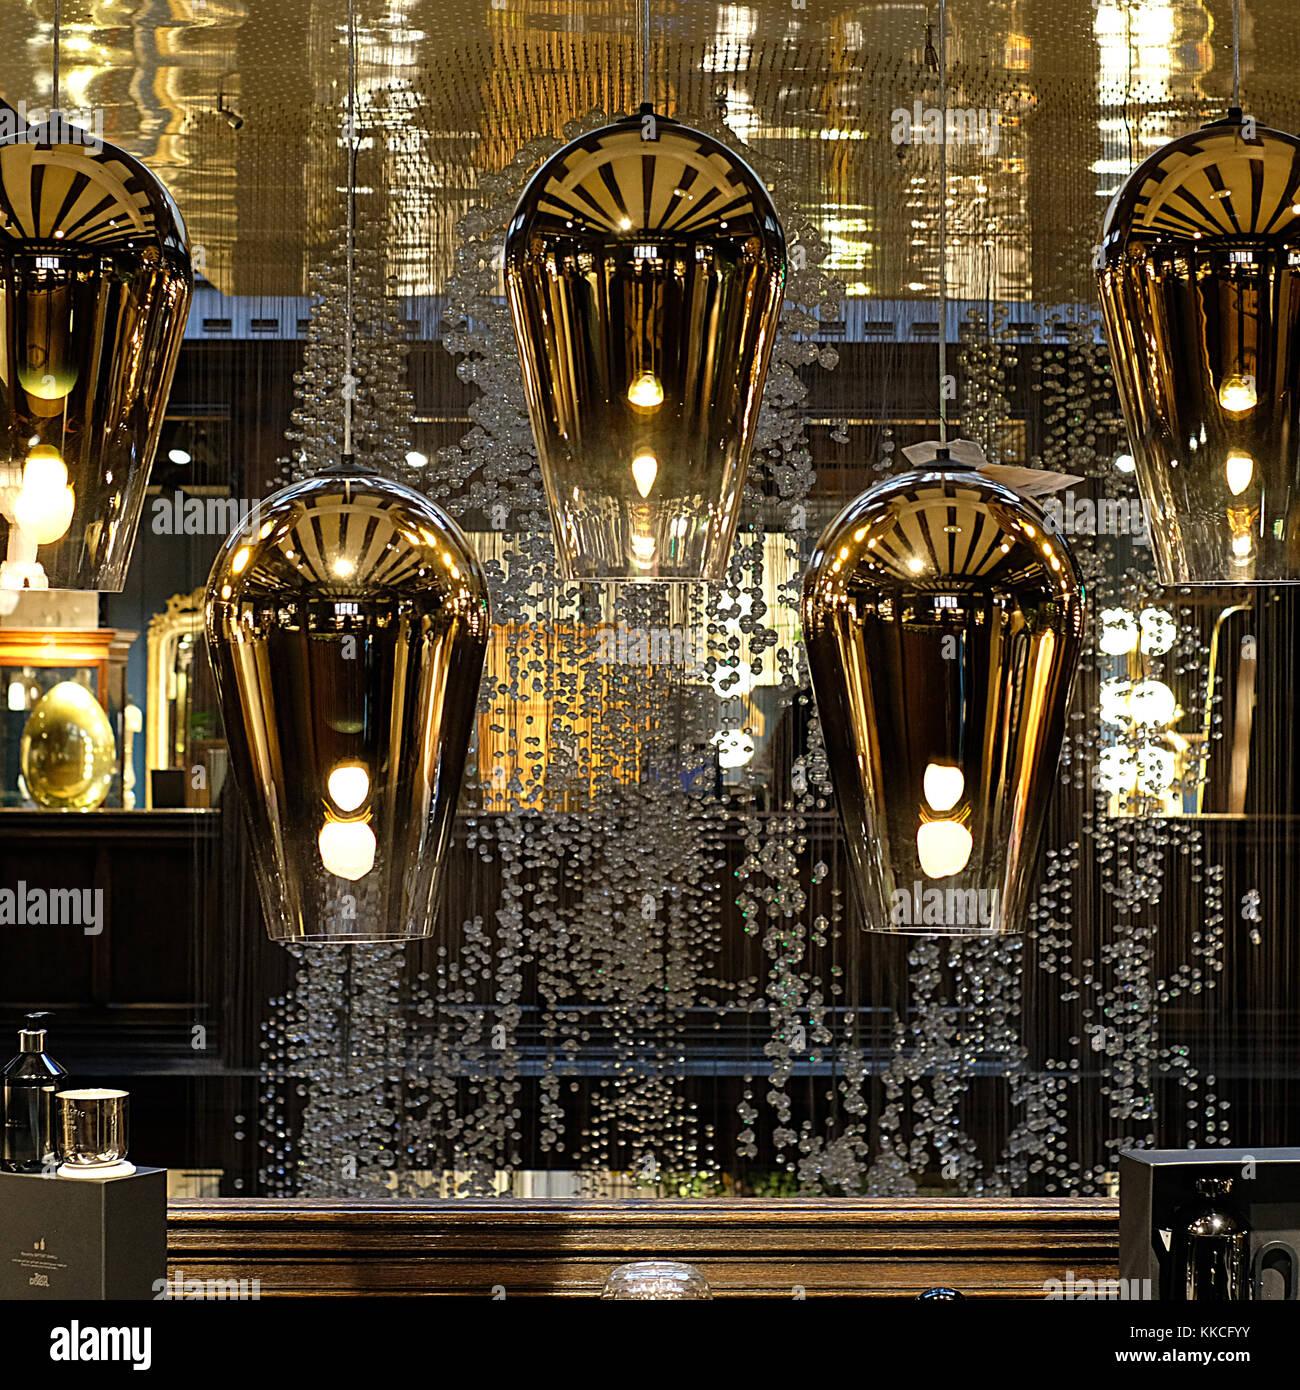 Tom Dixon pendant lights hanging in the Liberty of London store, Regent Street London UK. Stock Photo